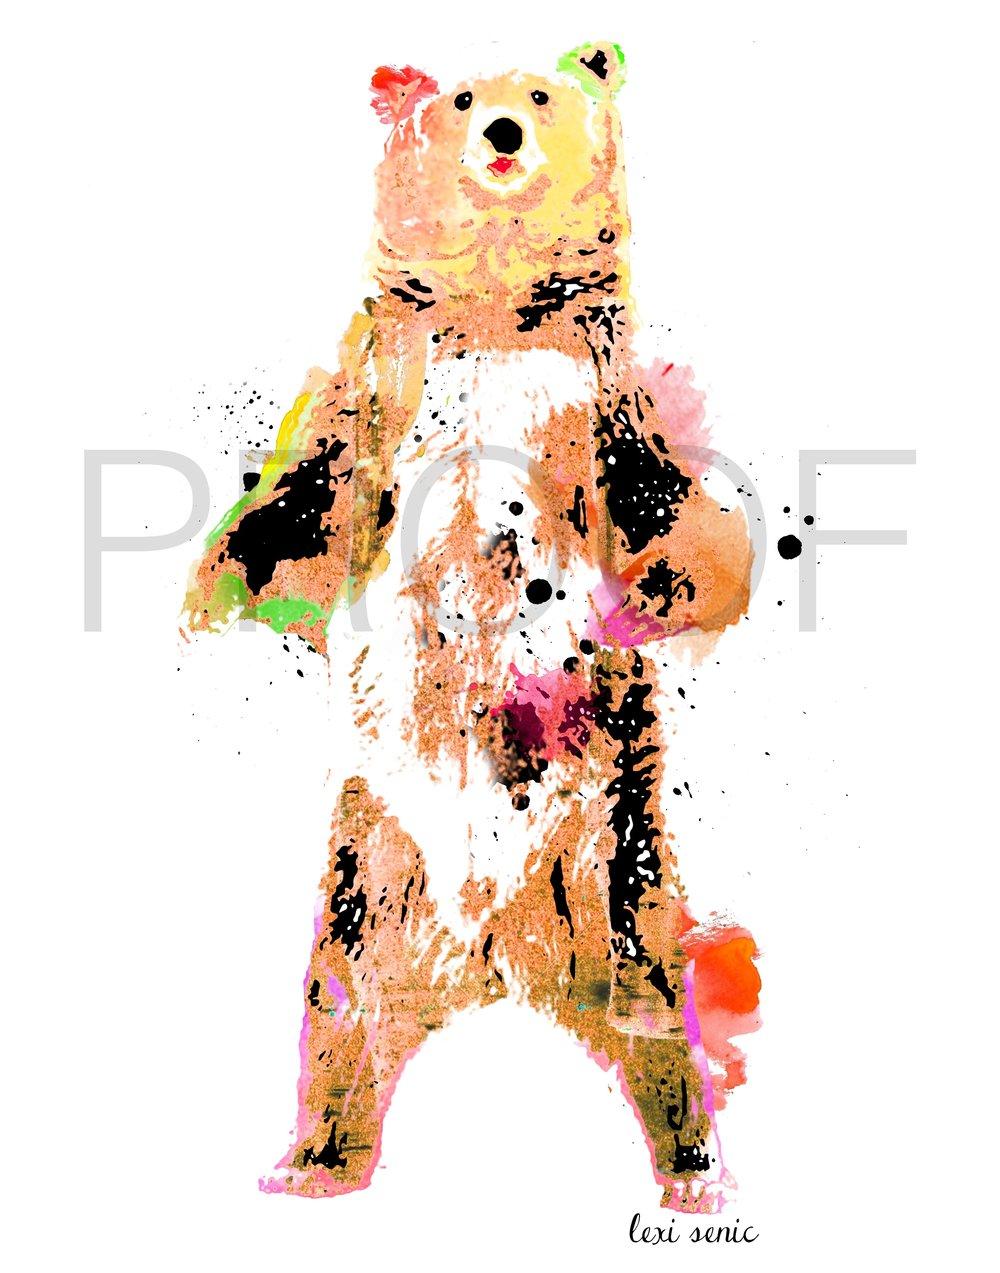 standing-bear-alone-proof.jpg